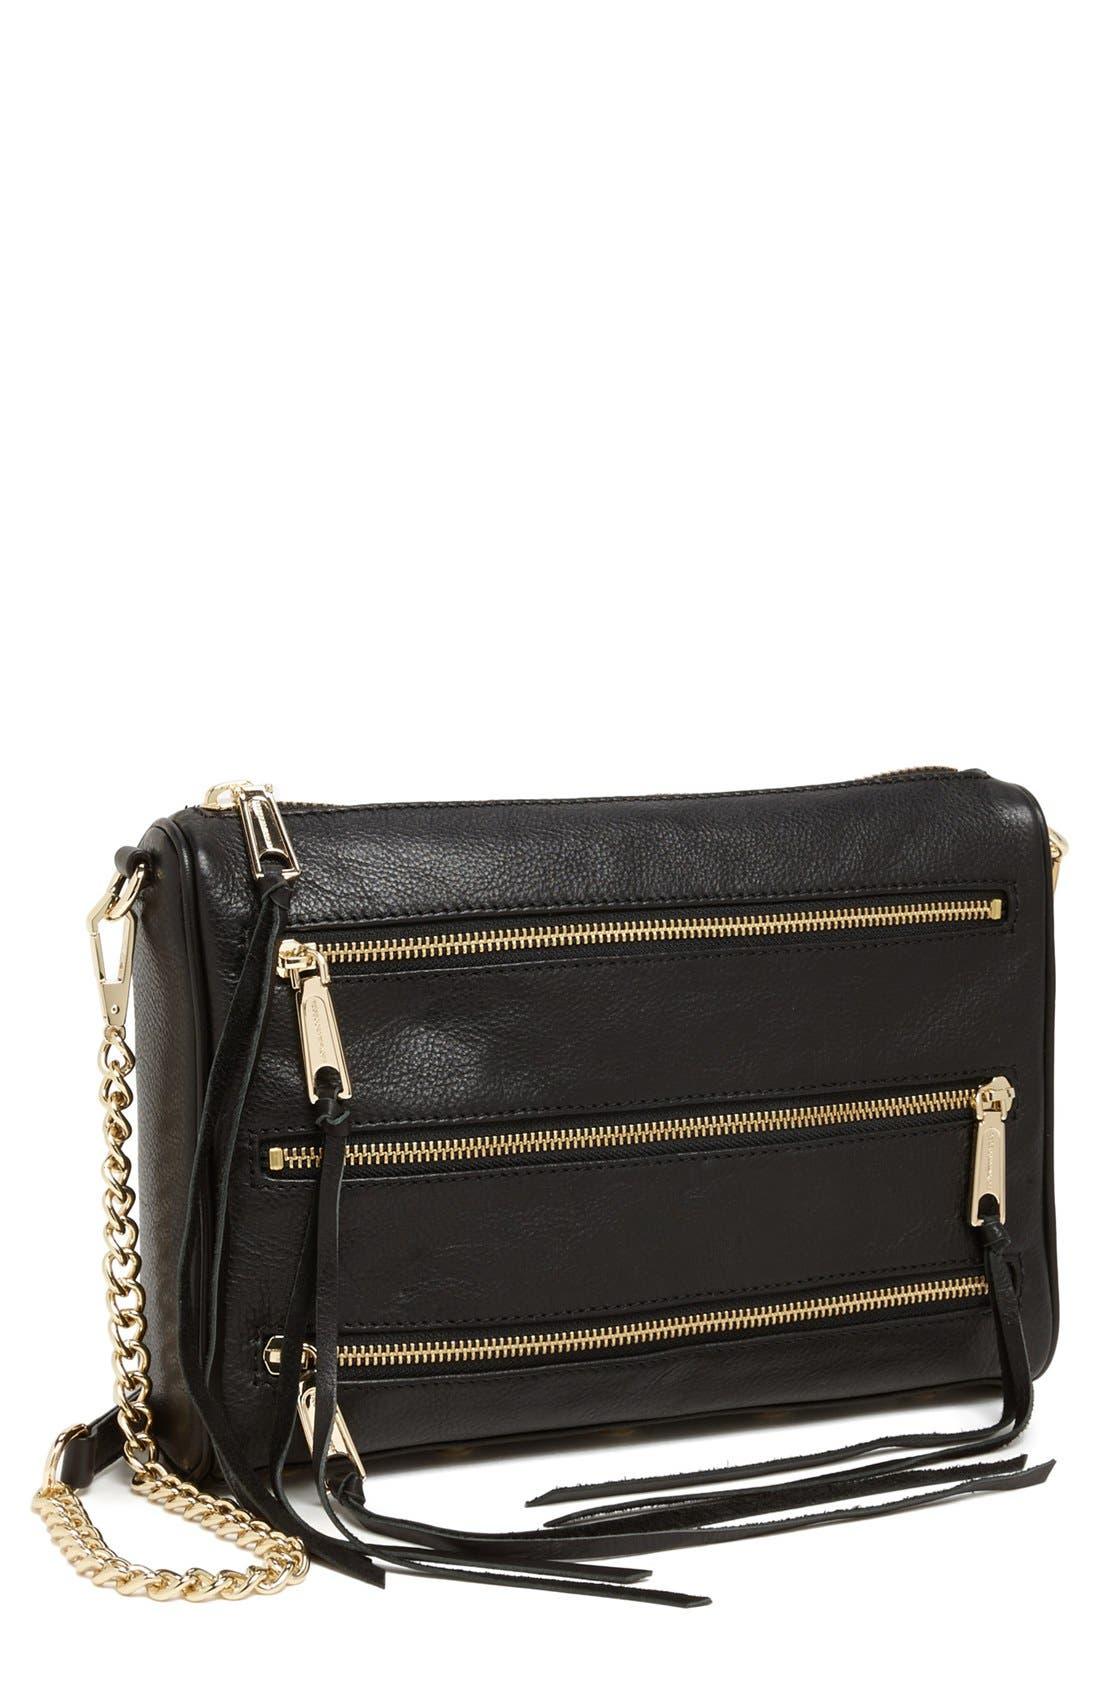 Main Image - Rebecca Minkoff '5-Zip' Crossbody Bag